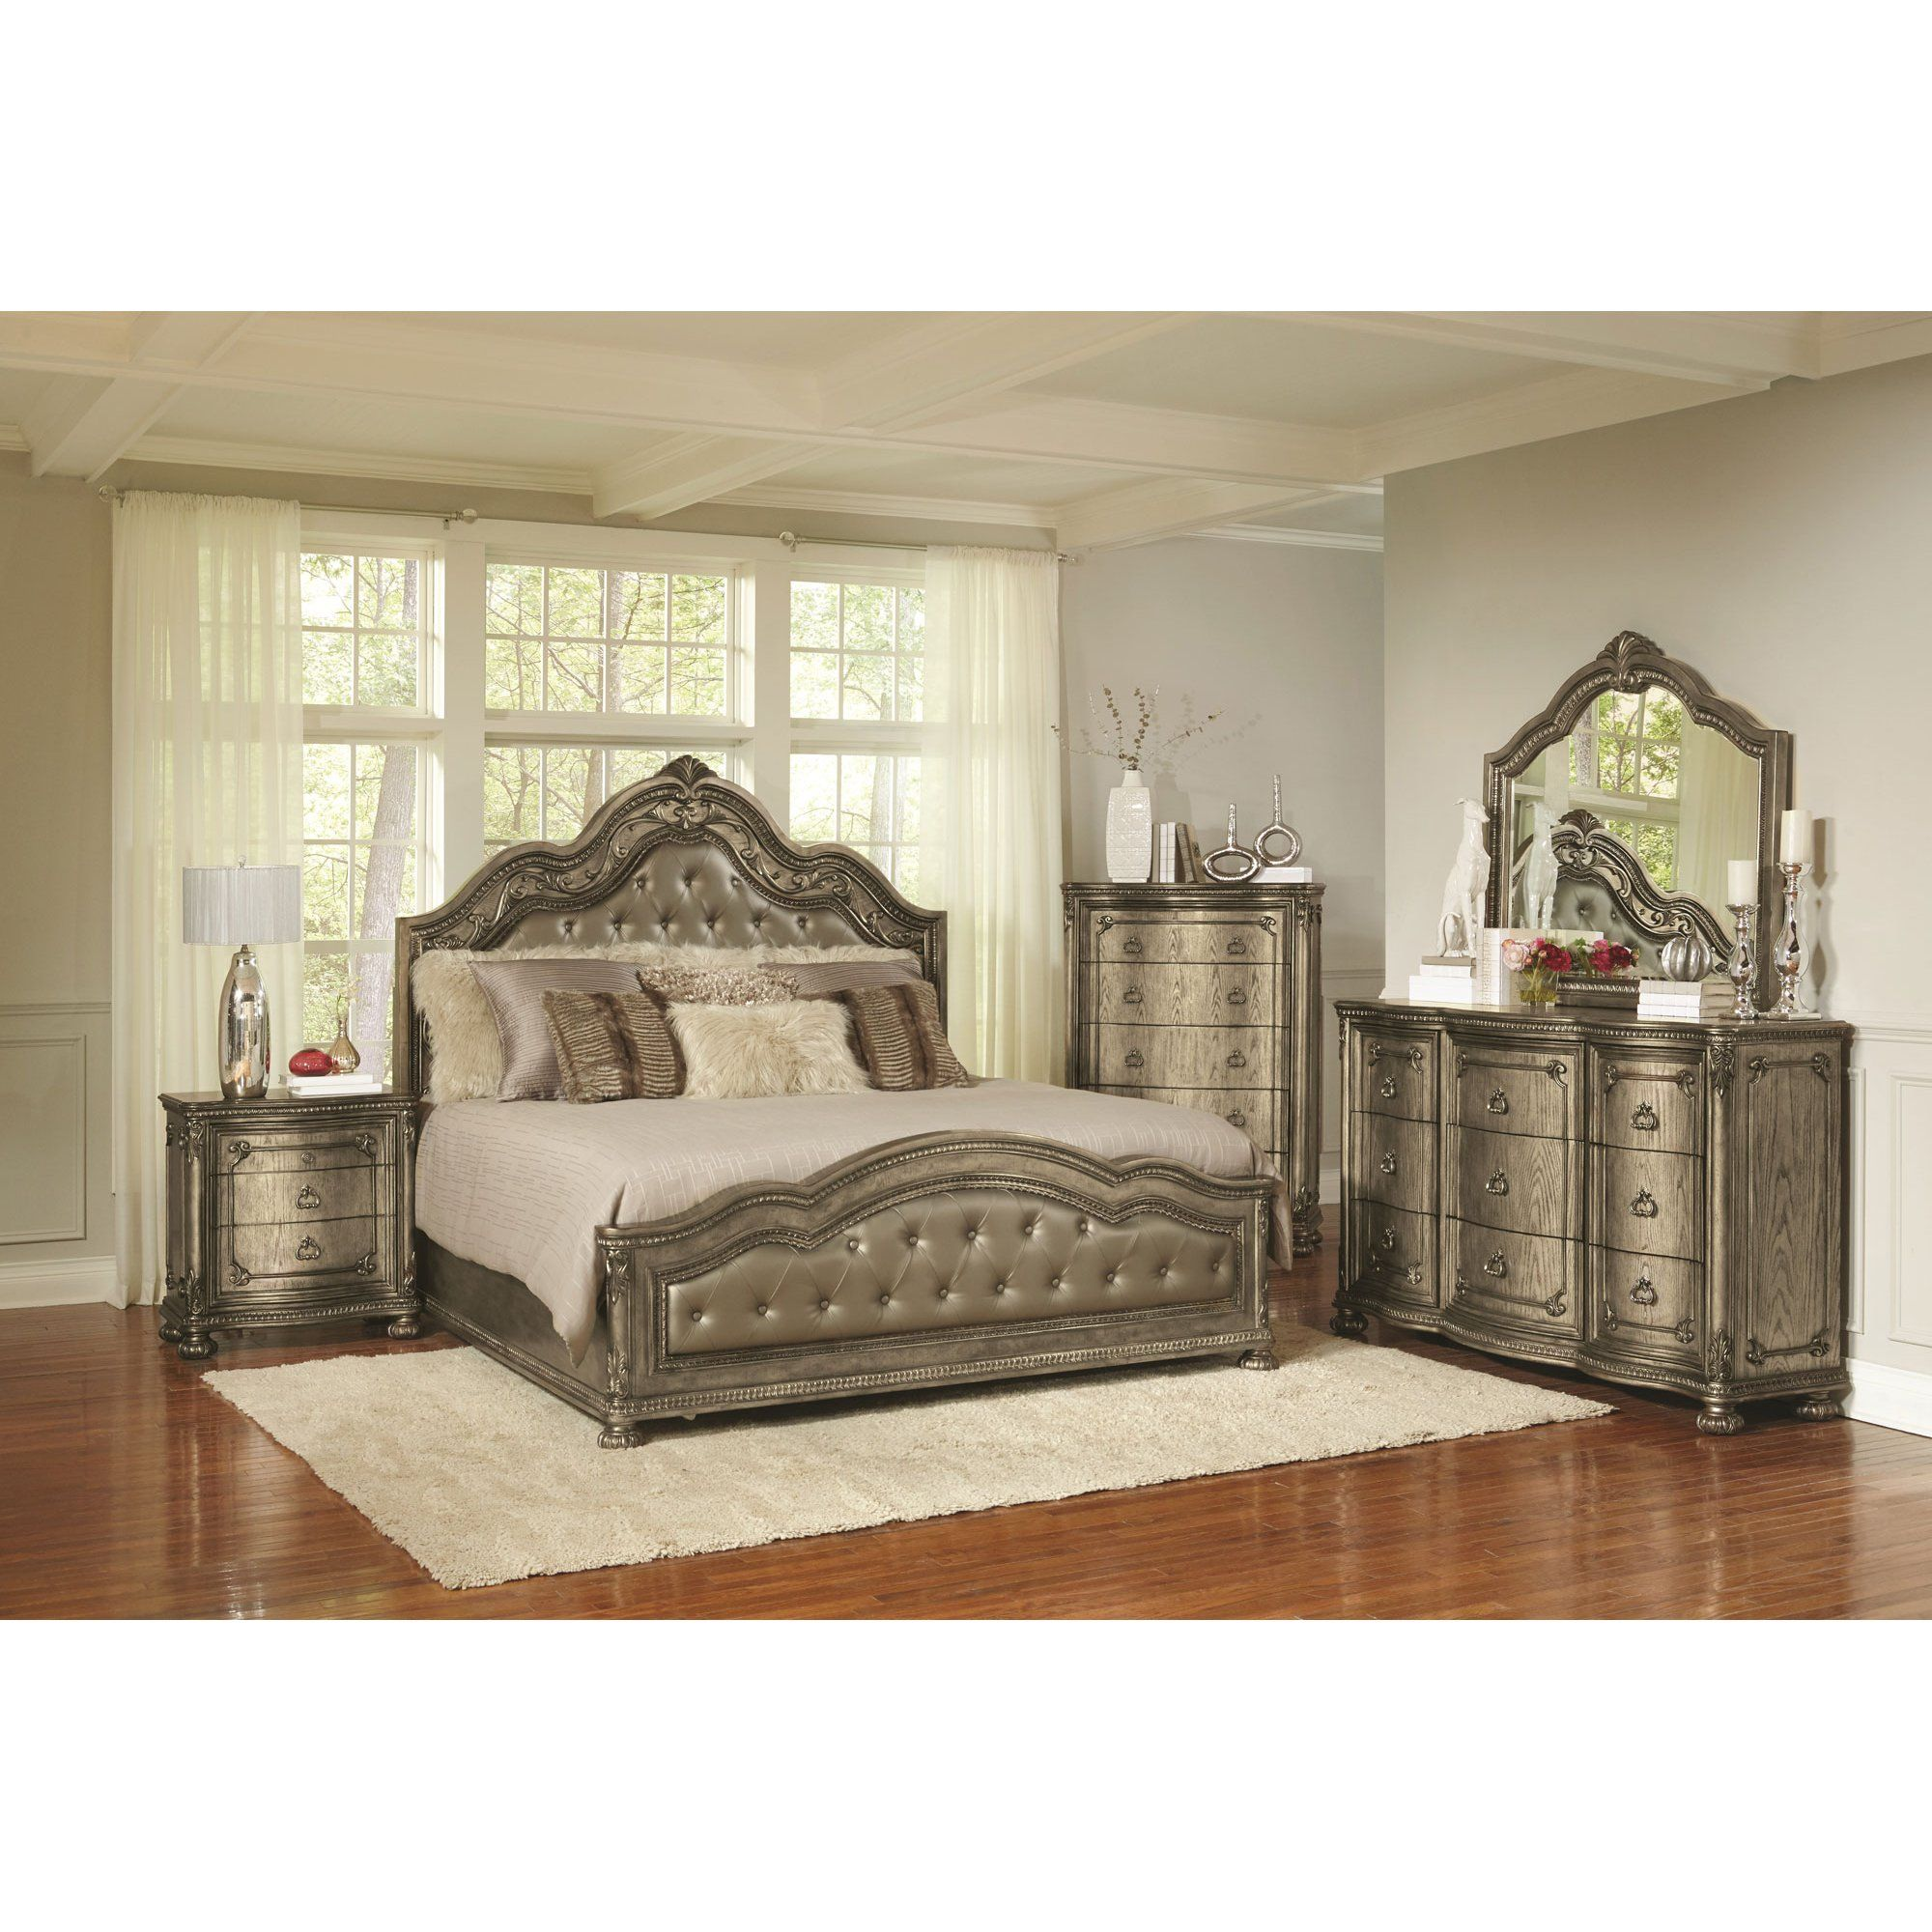 Traditional Platinum Gold 4 Piece King Bedroom Set Seville King Bedroom Sets Bedroom Sets Queen King Size Bedroom Sets